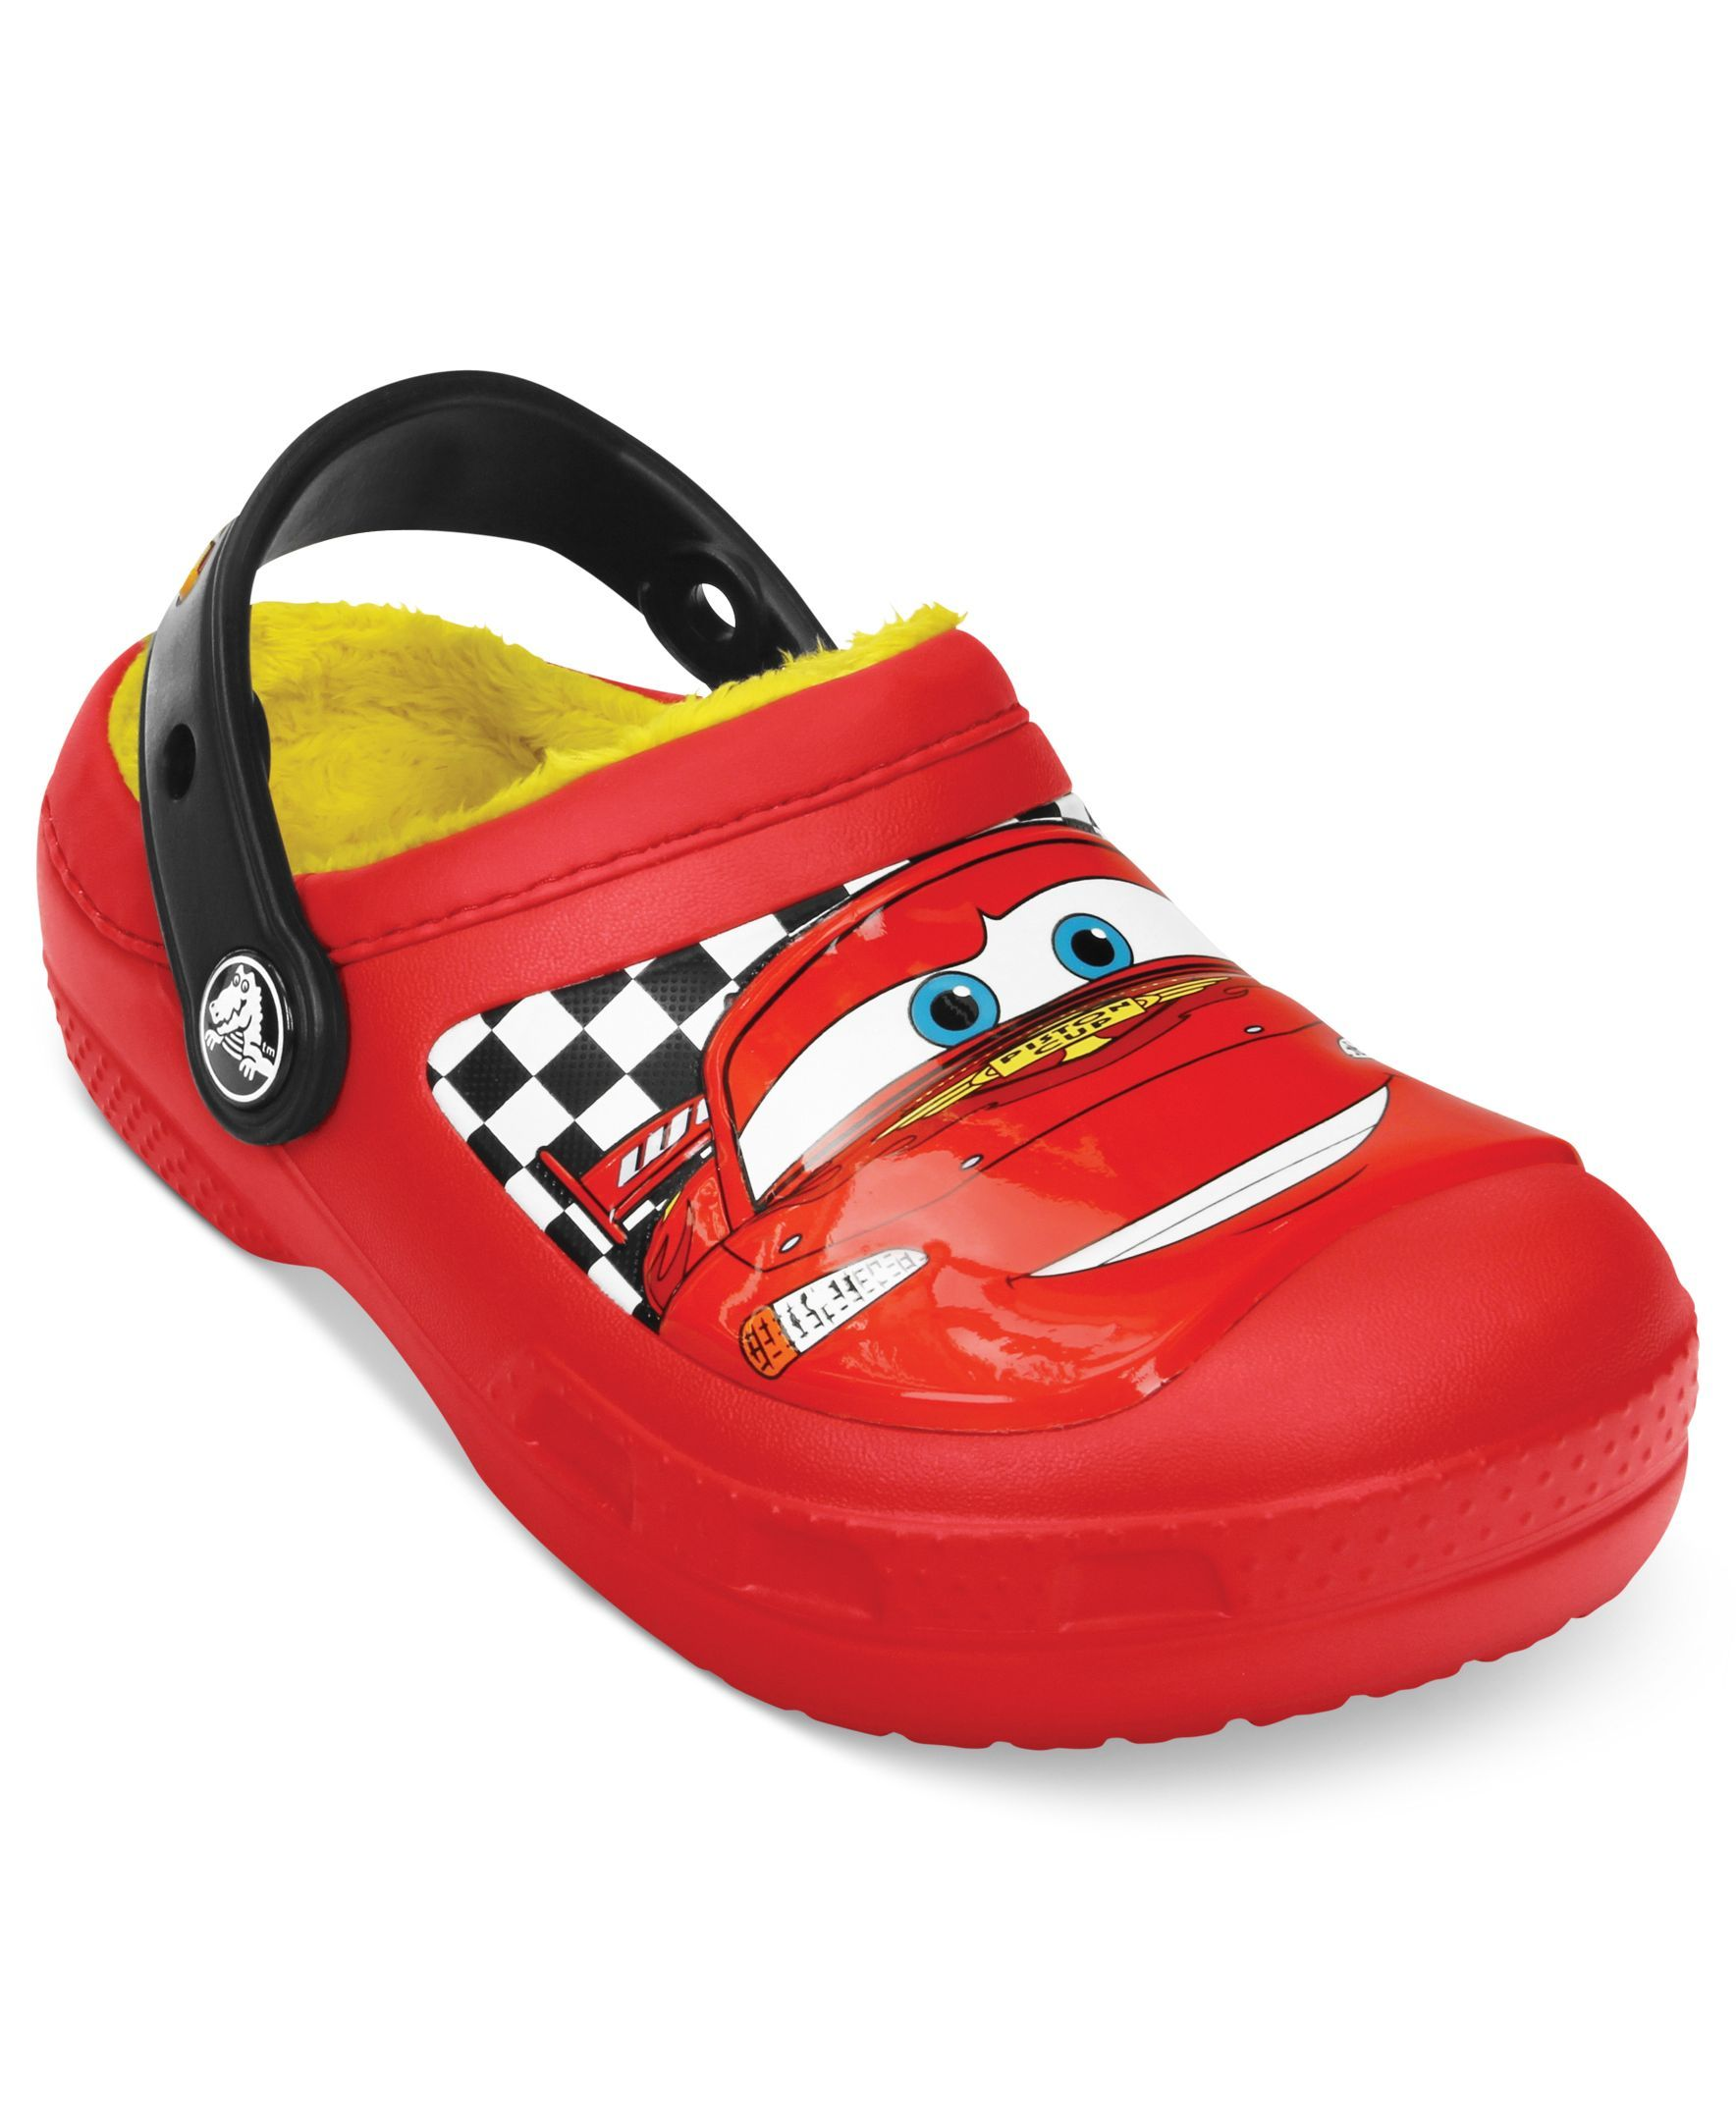 Crocs Kids Shoes Boys or Little Boys Cc Lightning McQueen Lnd Clogs  sc 1 st  Pinterest & Crocs Kids Shoes Boys or Little Boys Cc Lightning McQueen Lnd ... azcodes.com